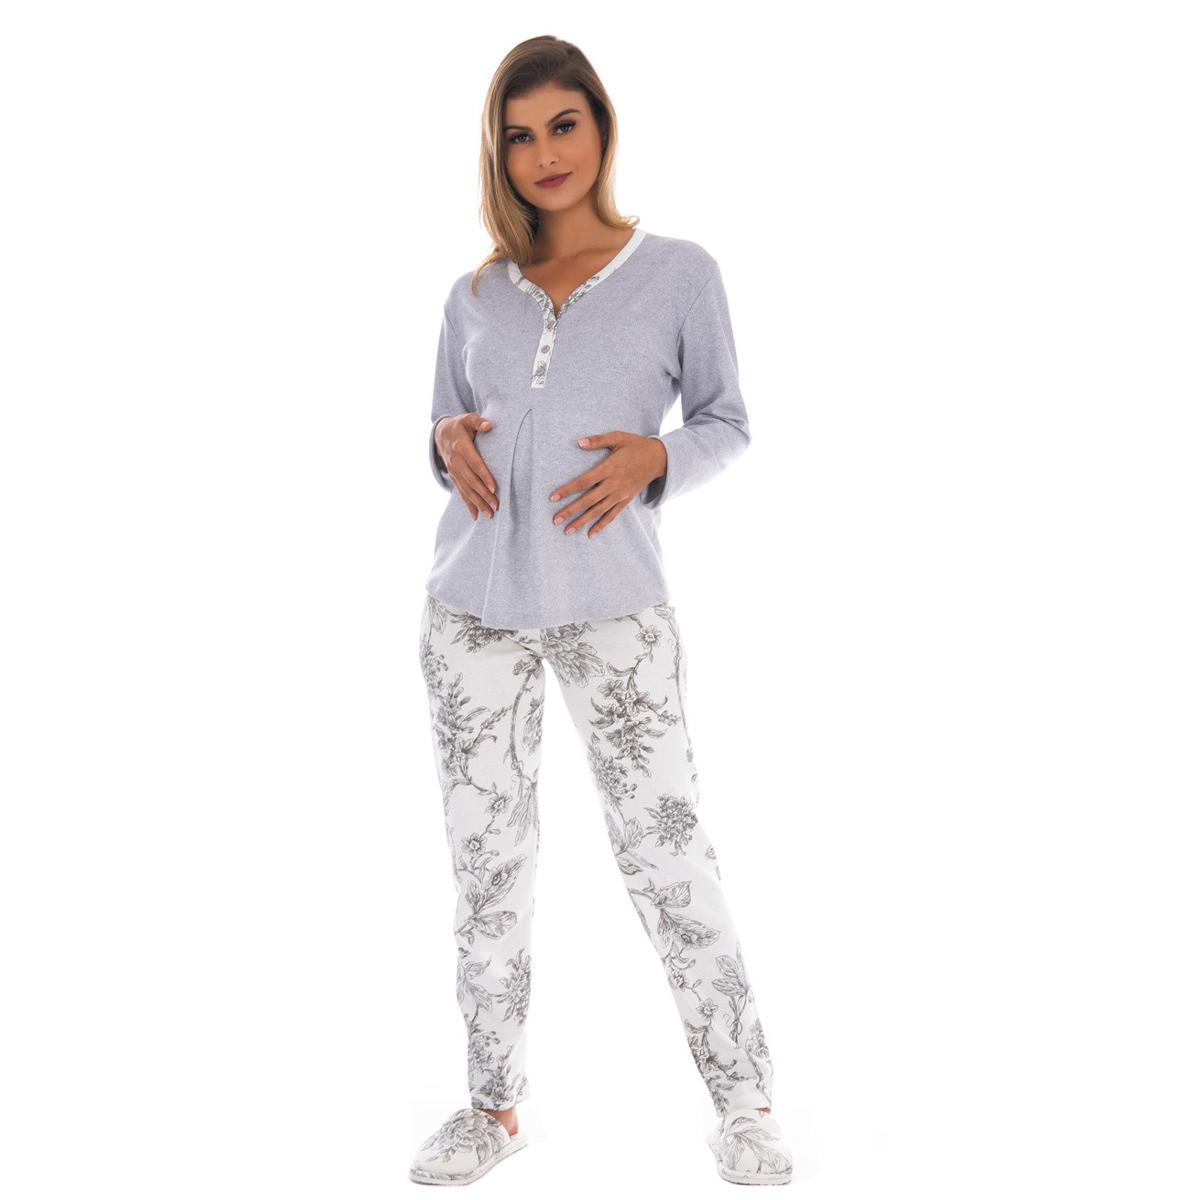 Pijama feminino para o inverno gestante ESPECIAL Victory